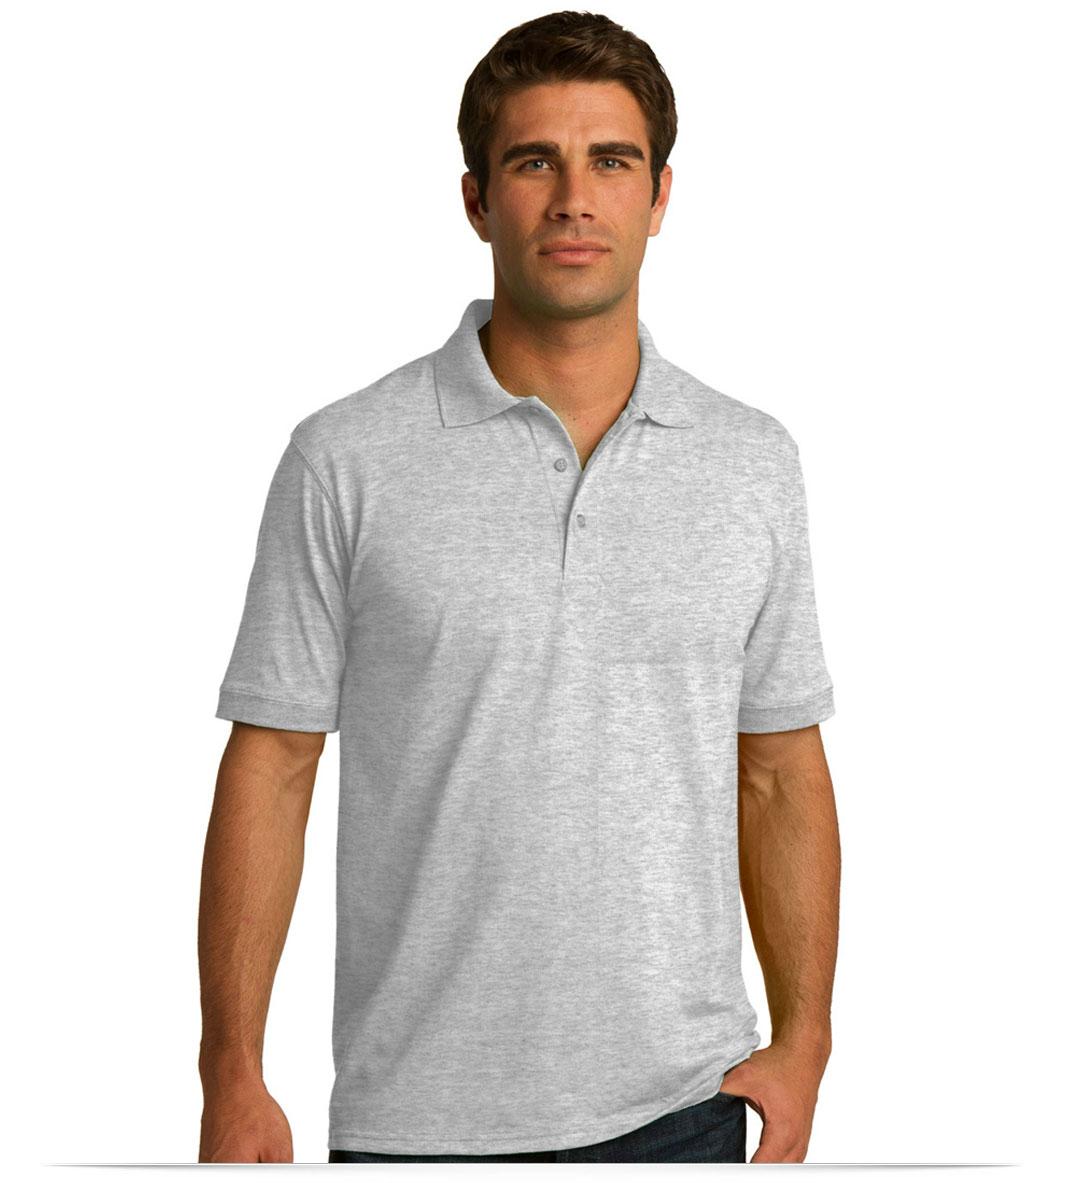 Design Embroidered Allstar Logo 5050 Jersey Knit Polo Shirt Online